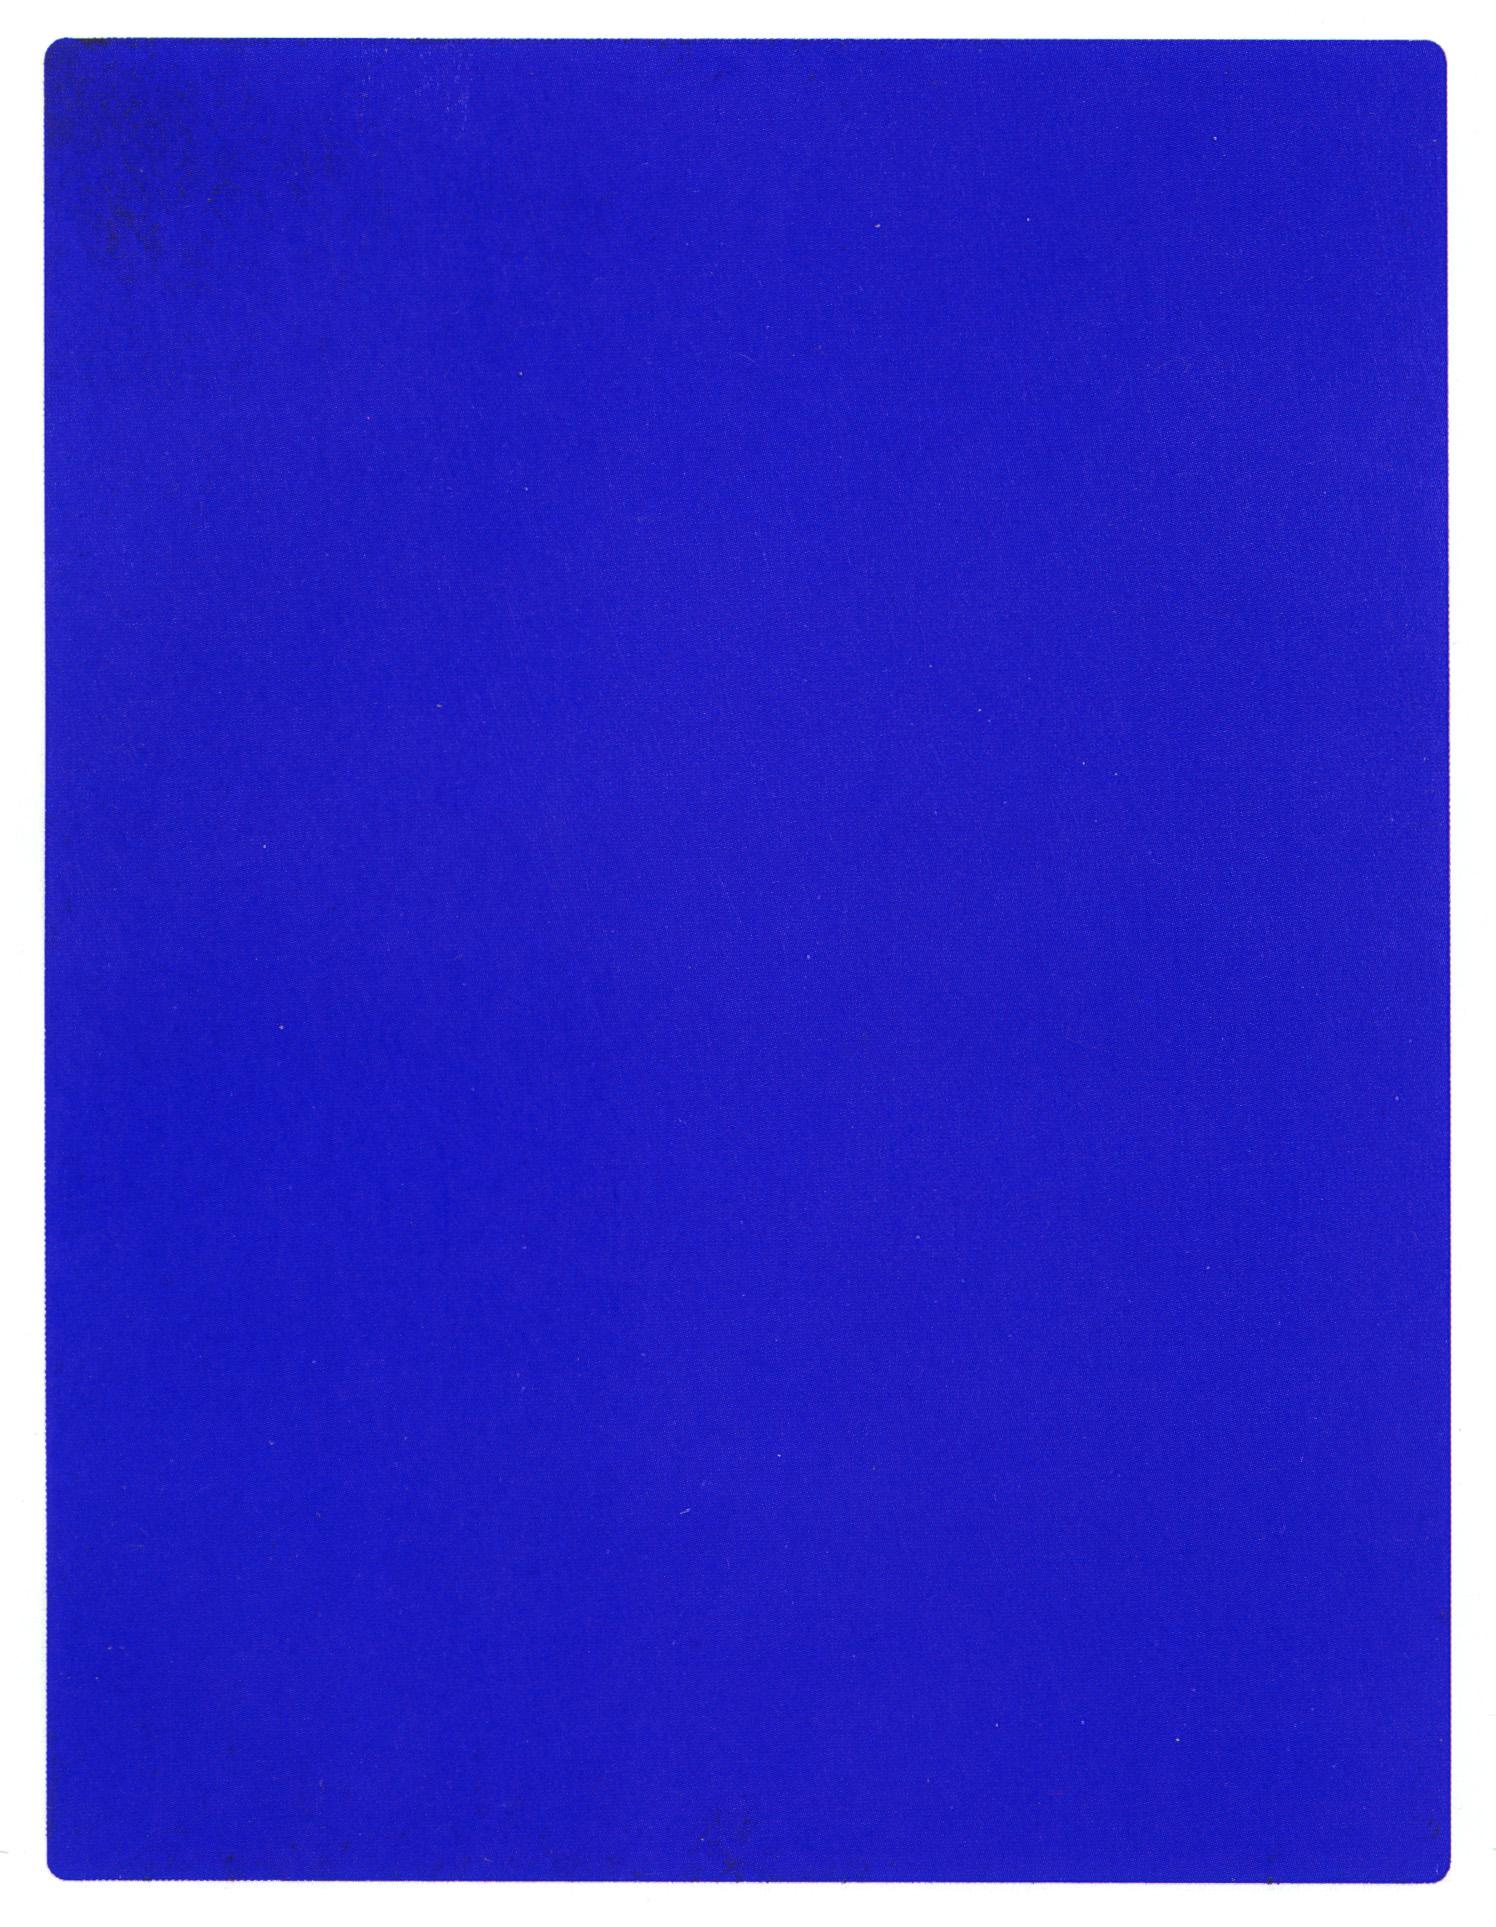 International Klein Blue Wikipedia